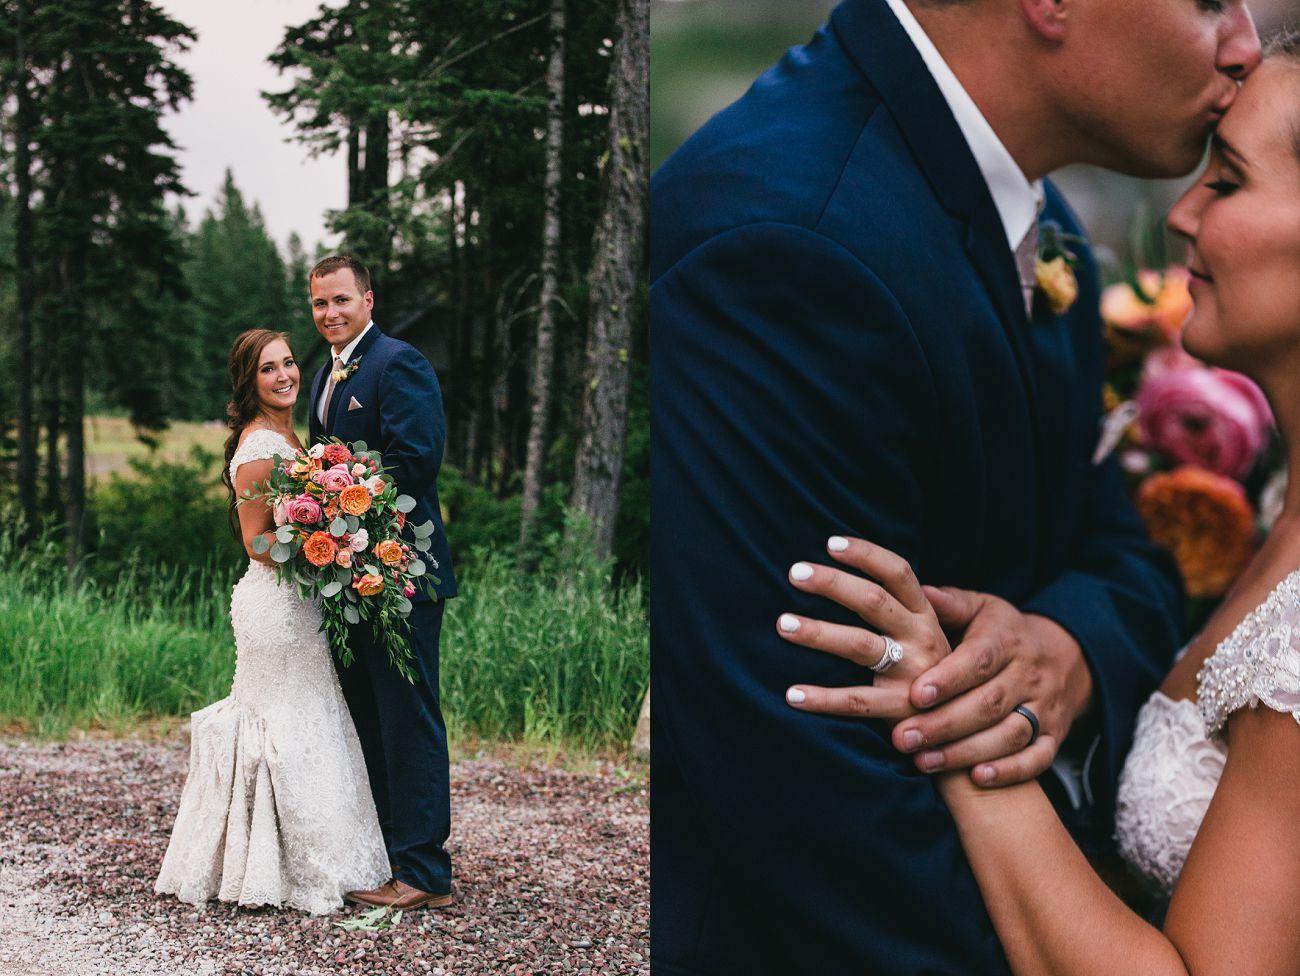 Jennifer_Mooney_Photo_Whitefish_Mountain_Resort_Wedding_00116.jpg